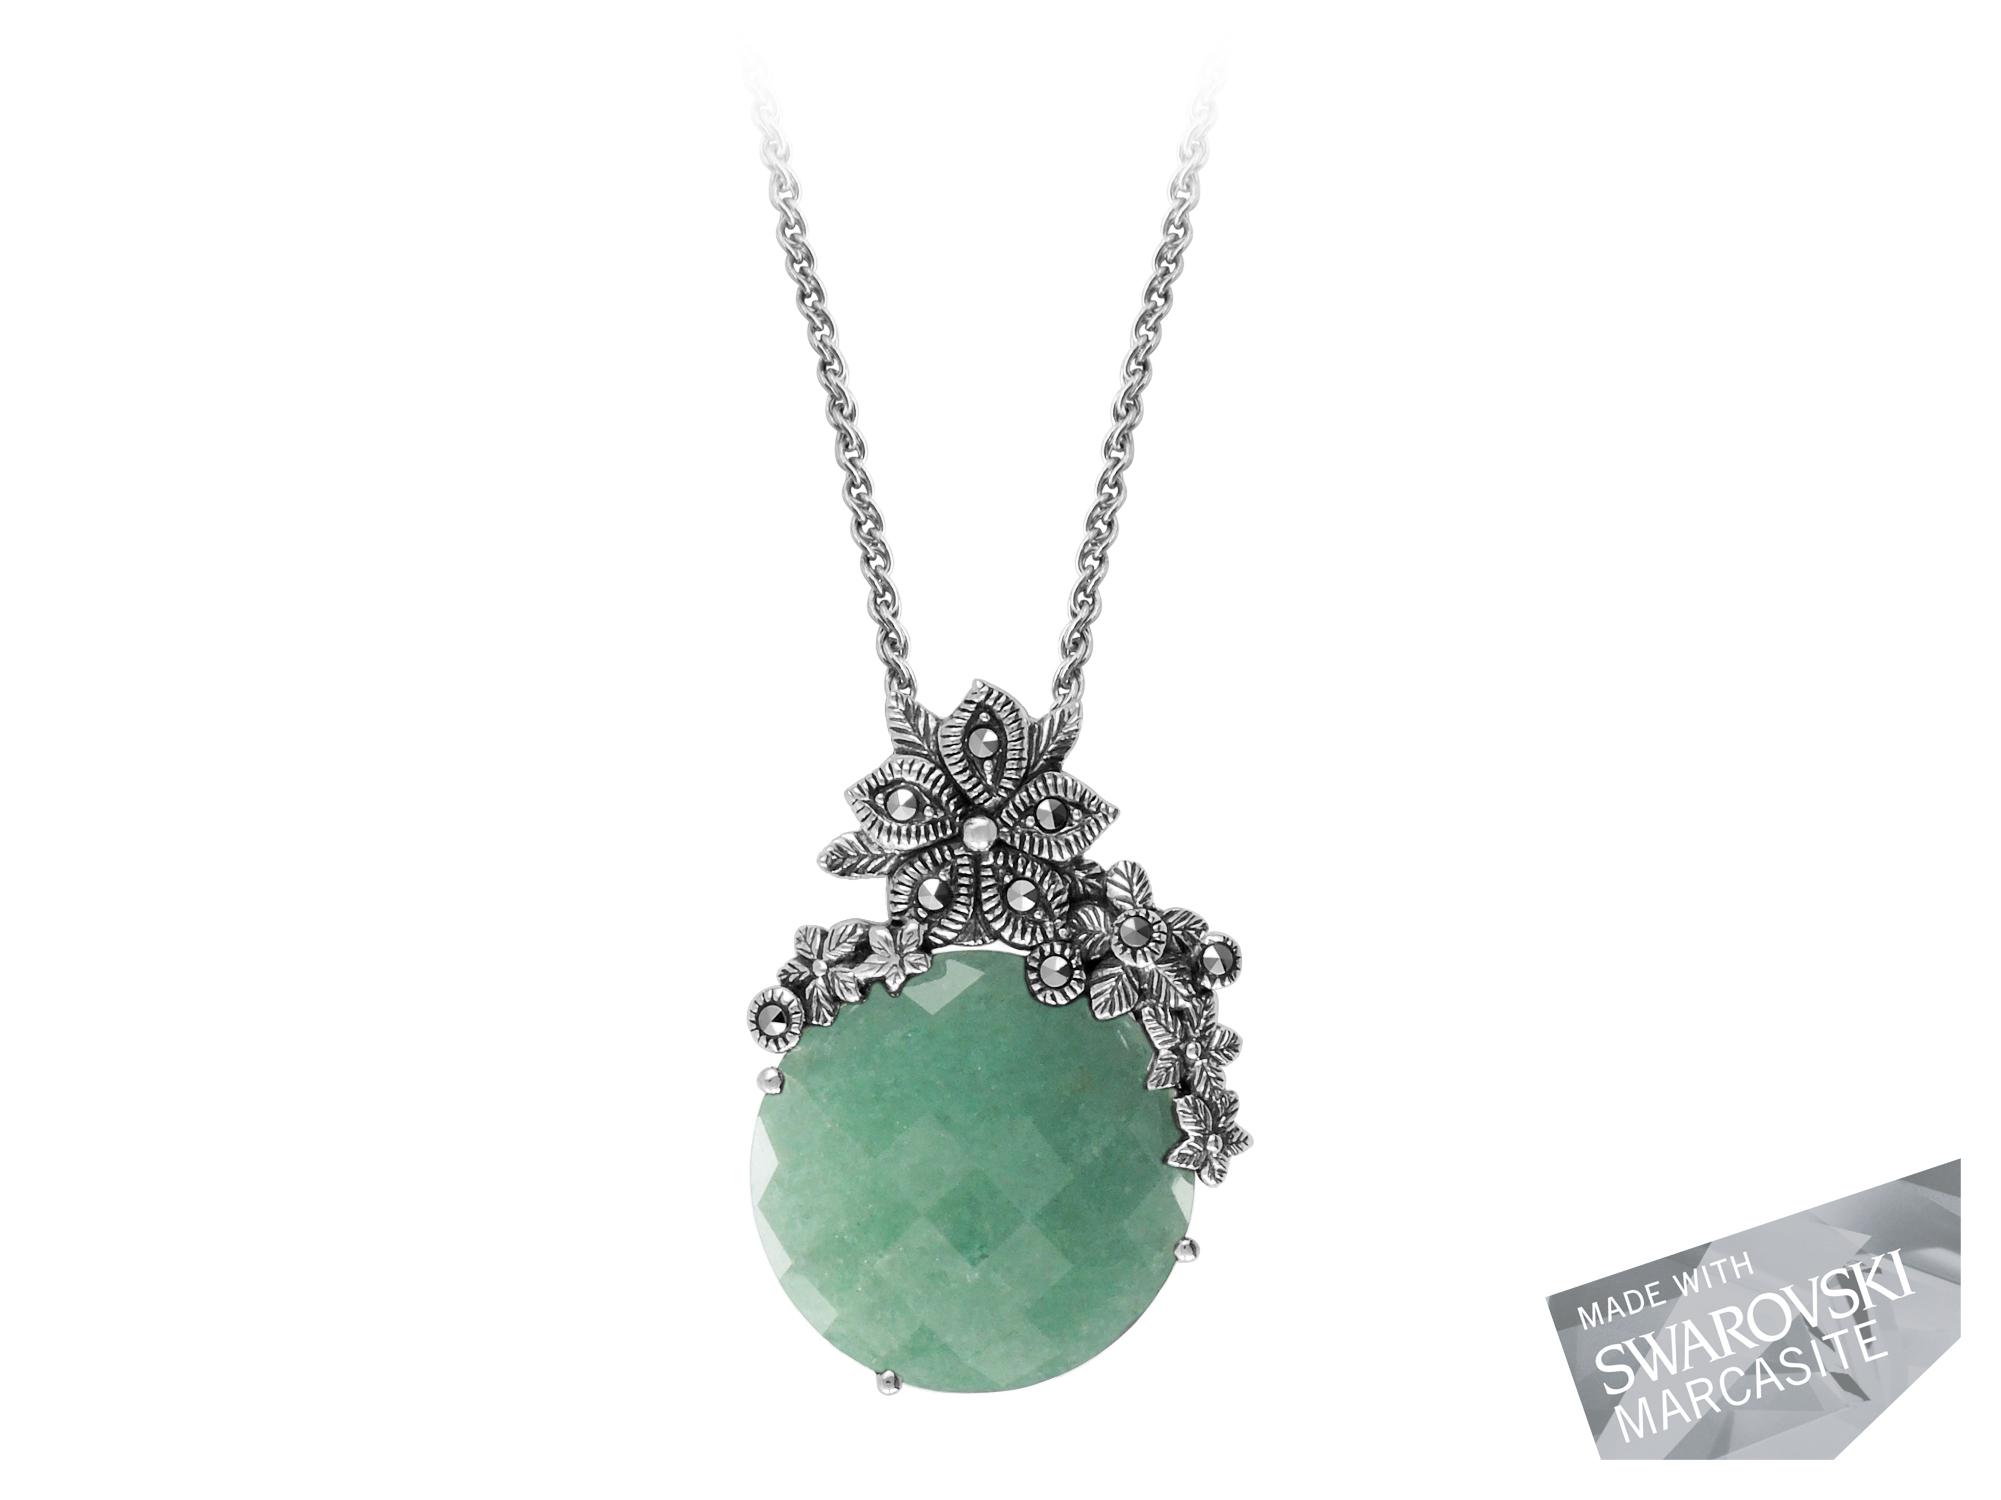 Green Aventurine Necklace MJ18907